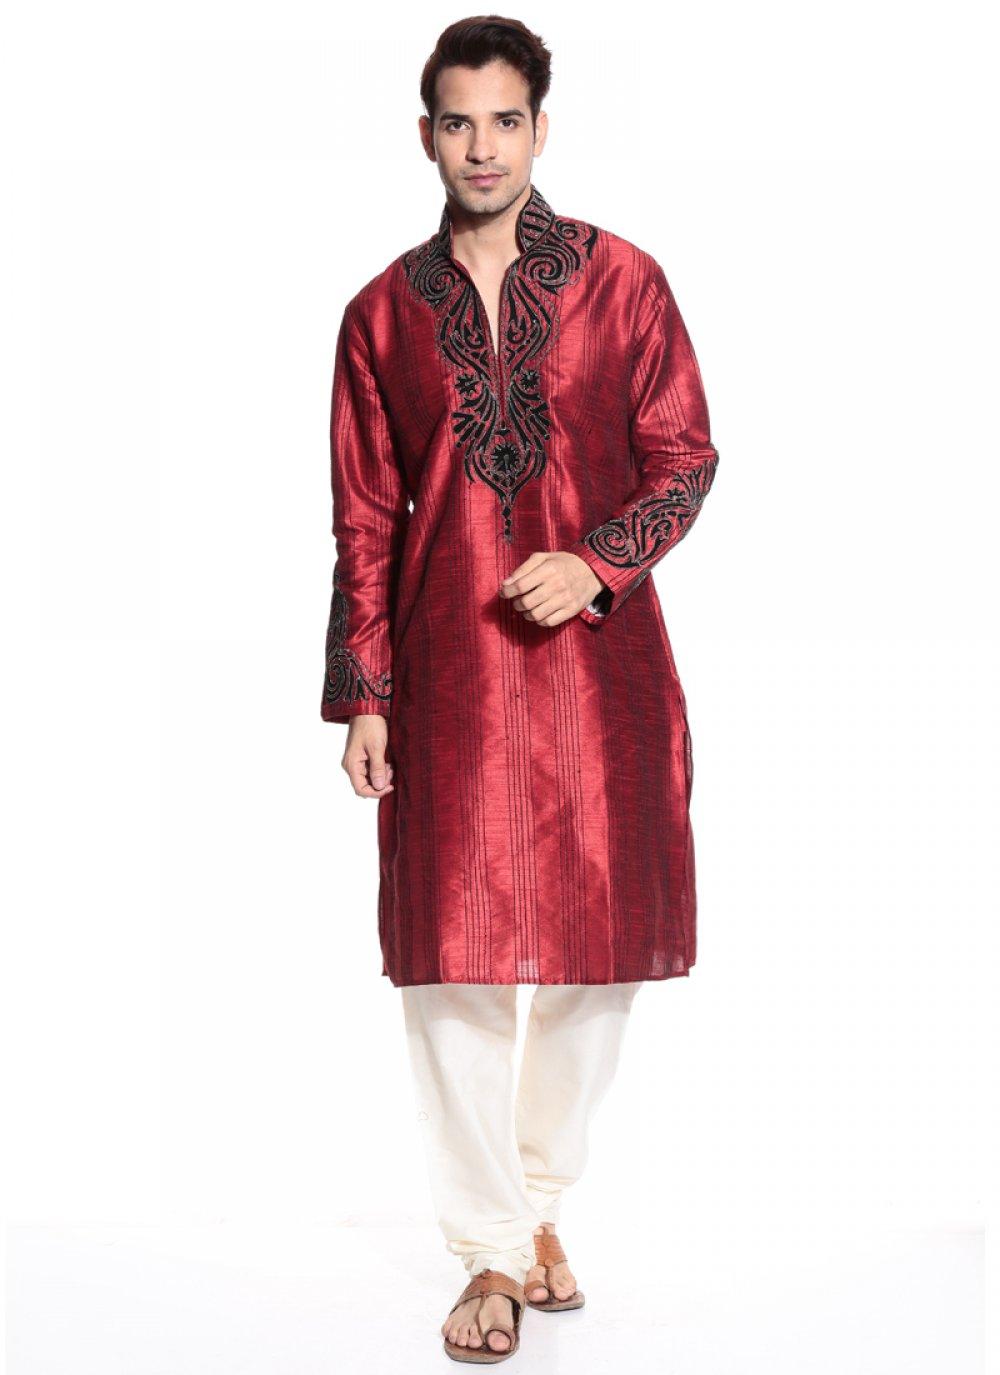 Maroon Dupion Silk Kurta Pyjama with Thread Work